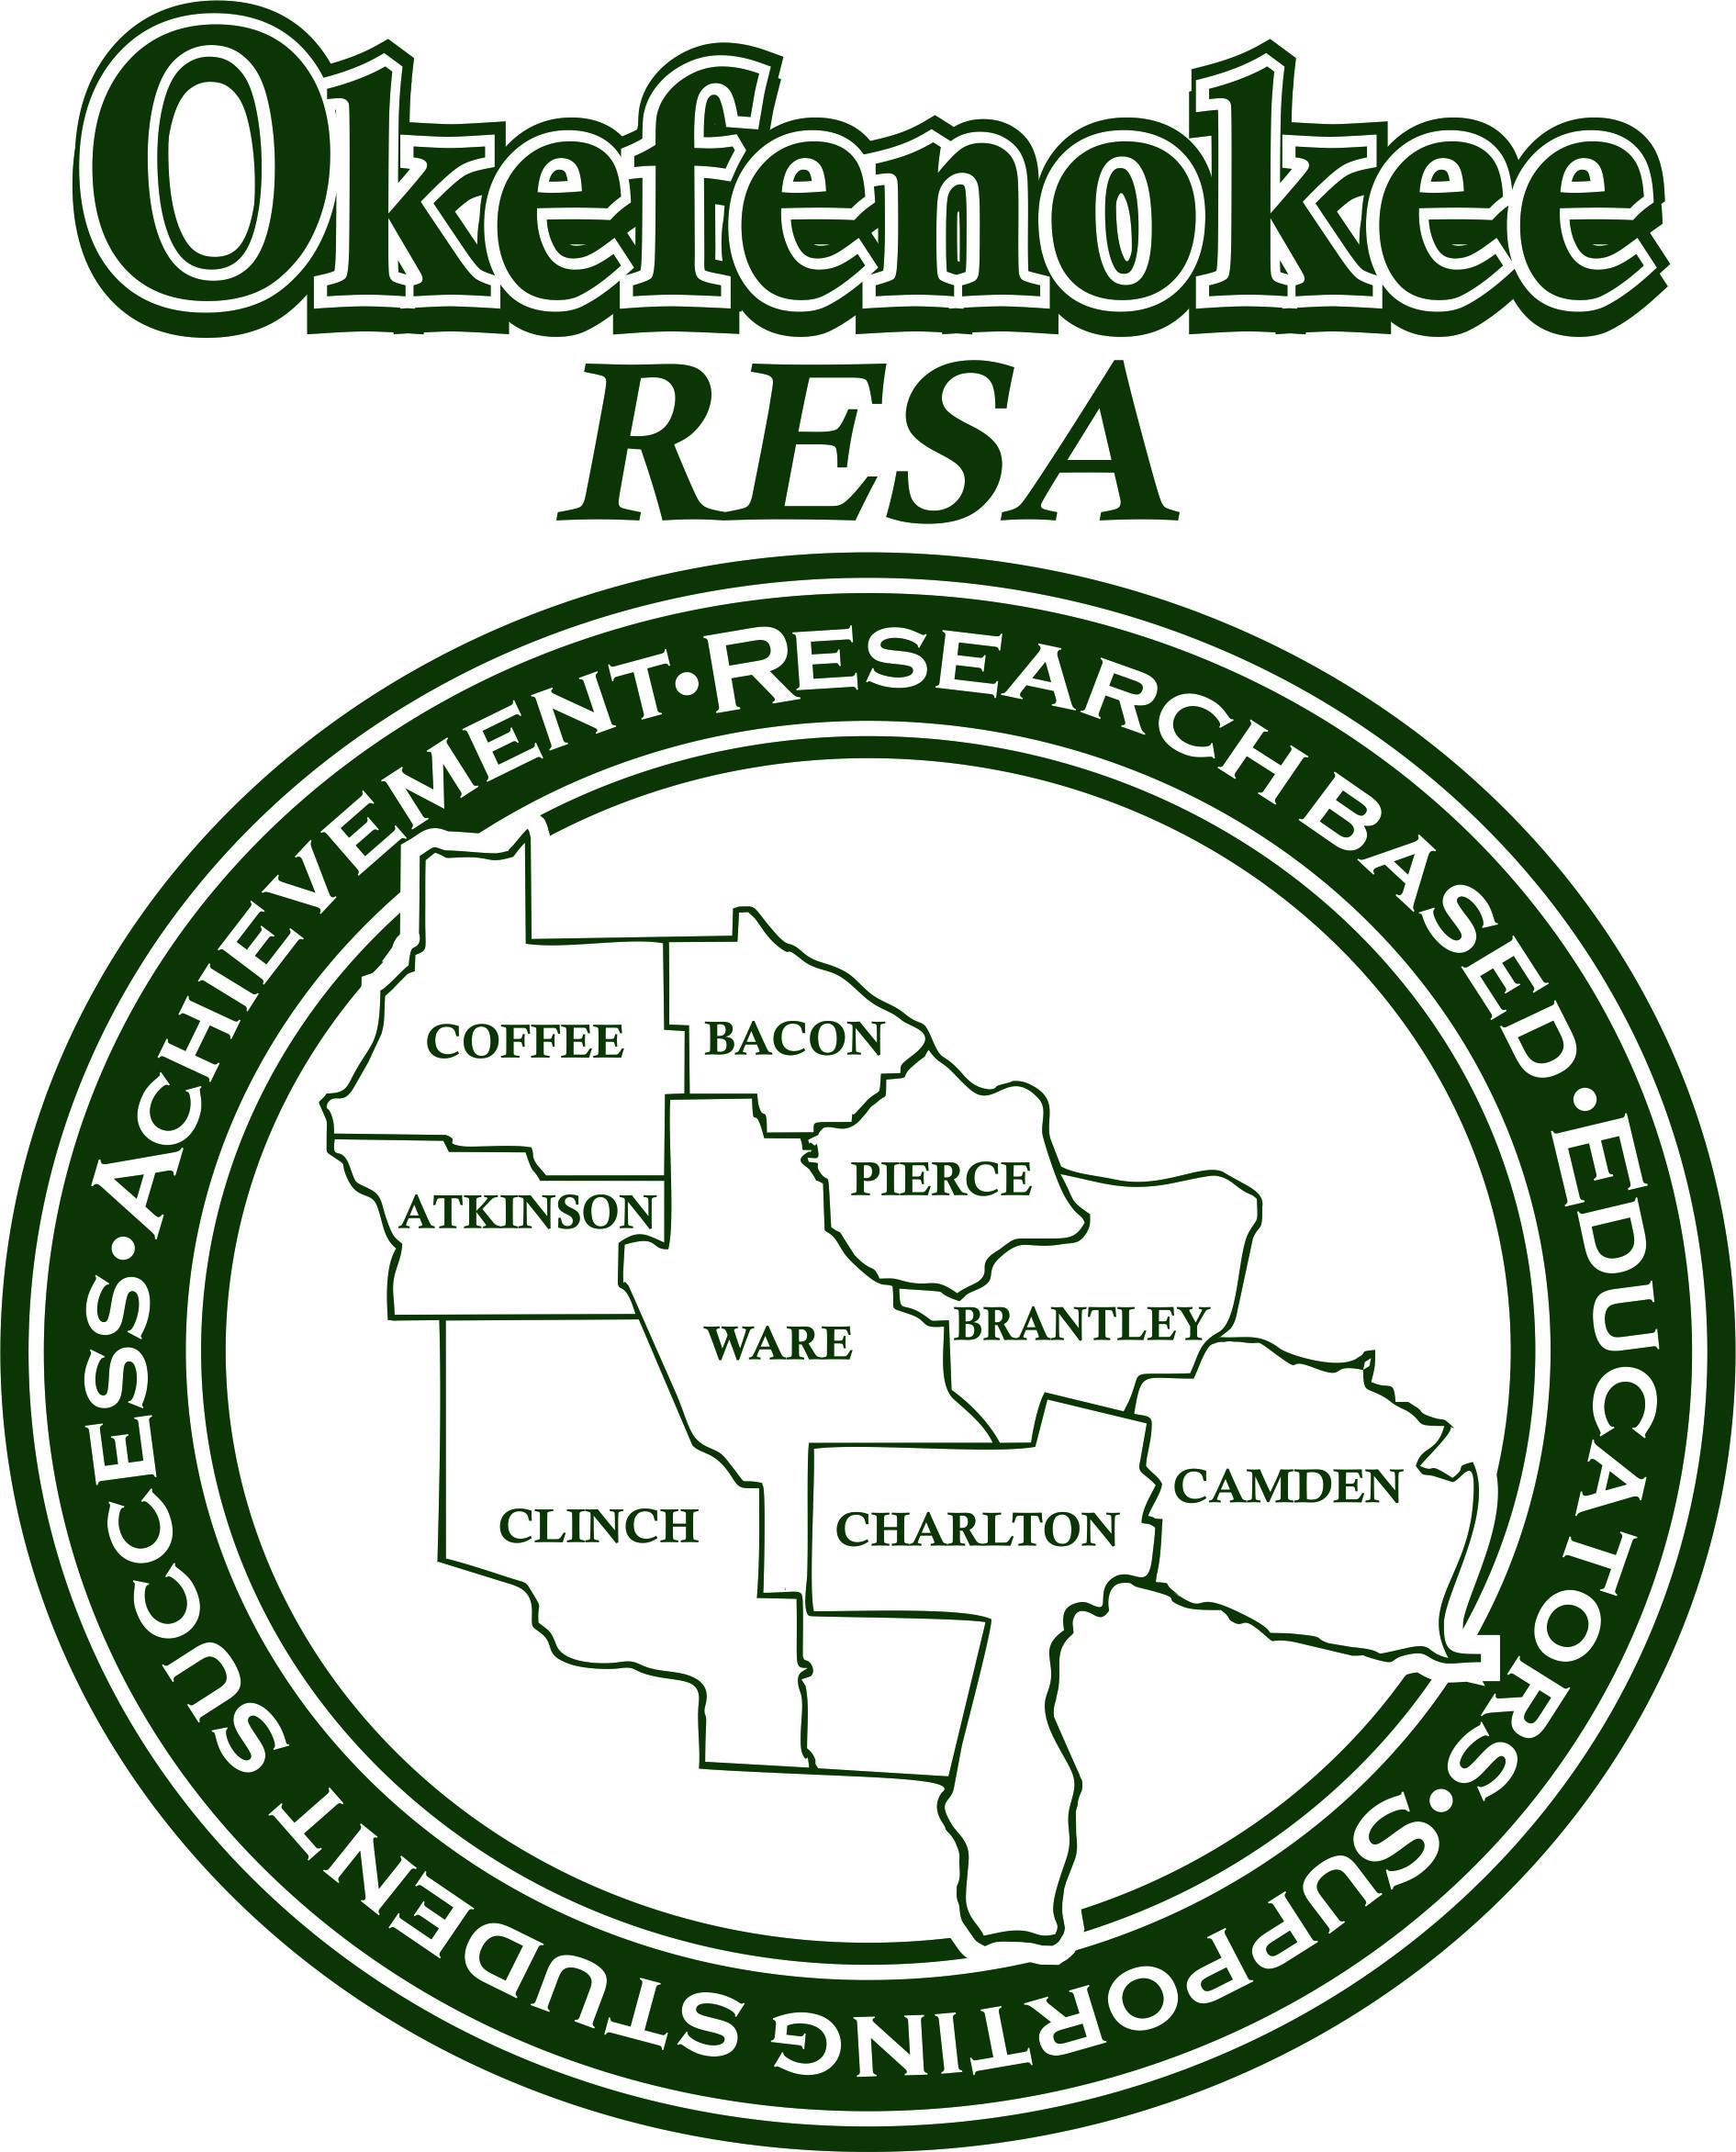 Okefenokee RESA